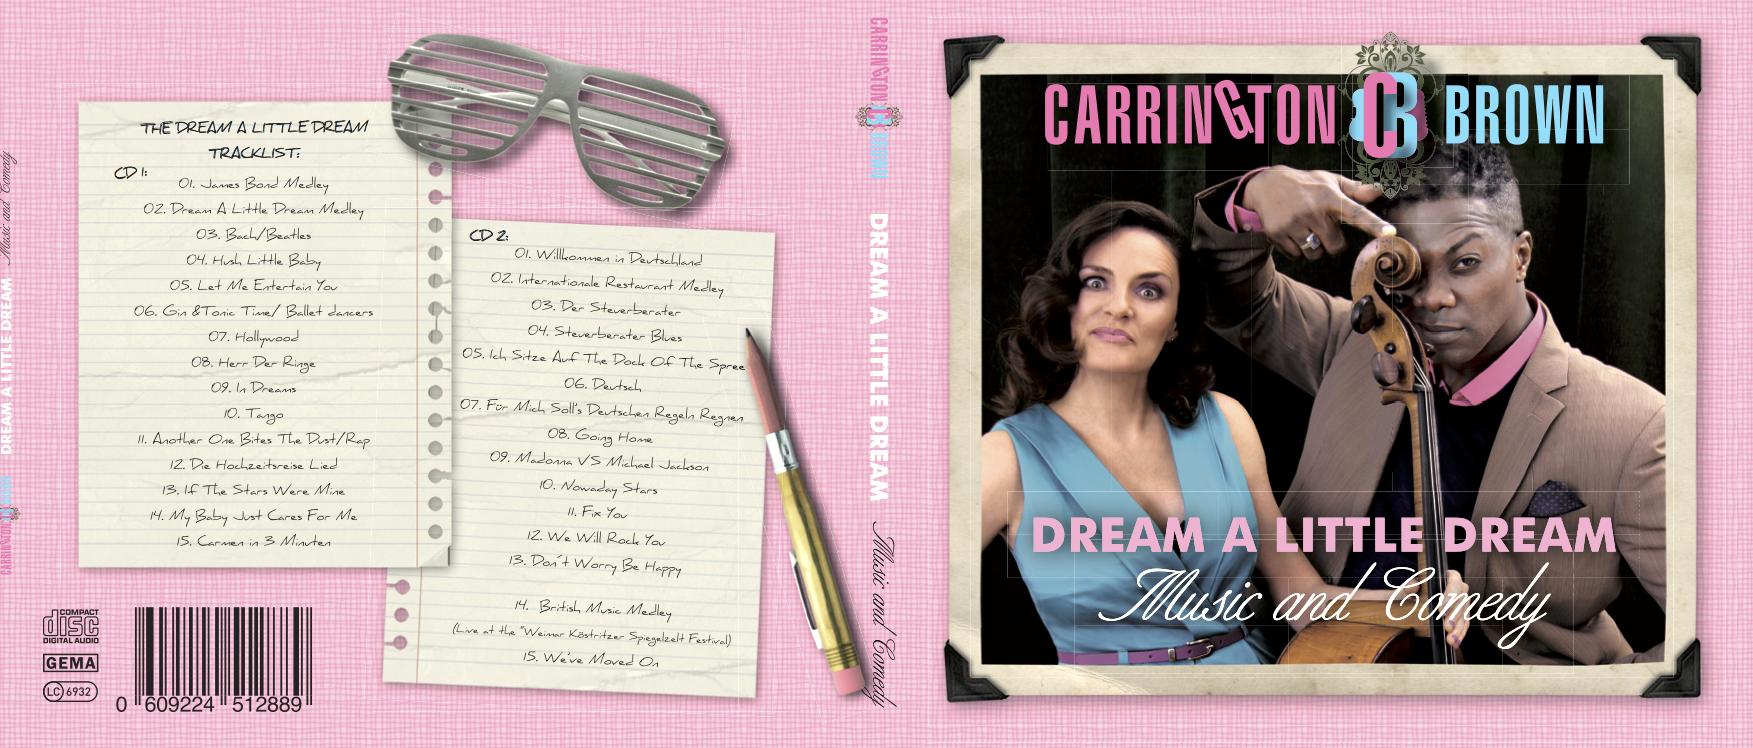 Dream a little dream – audio CD (live)